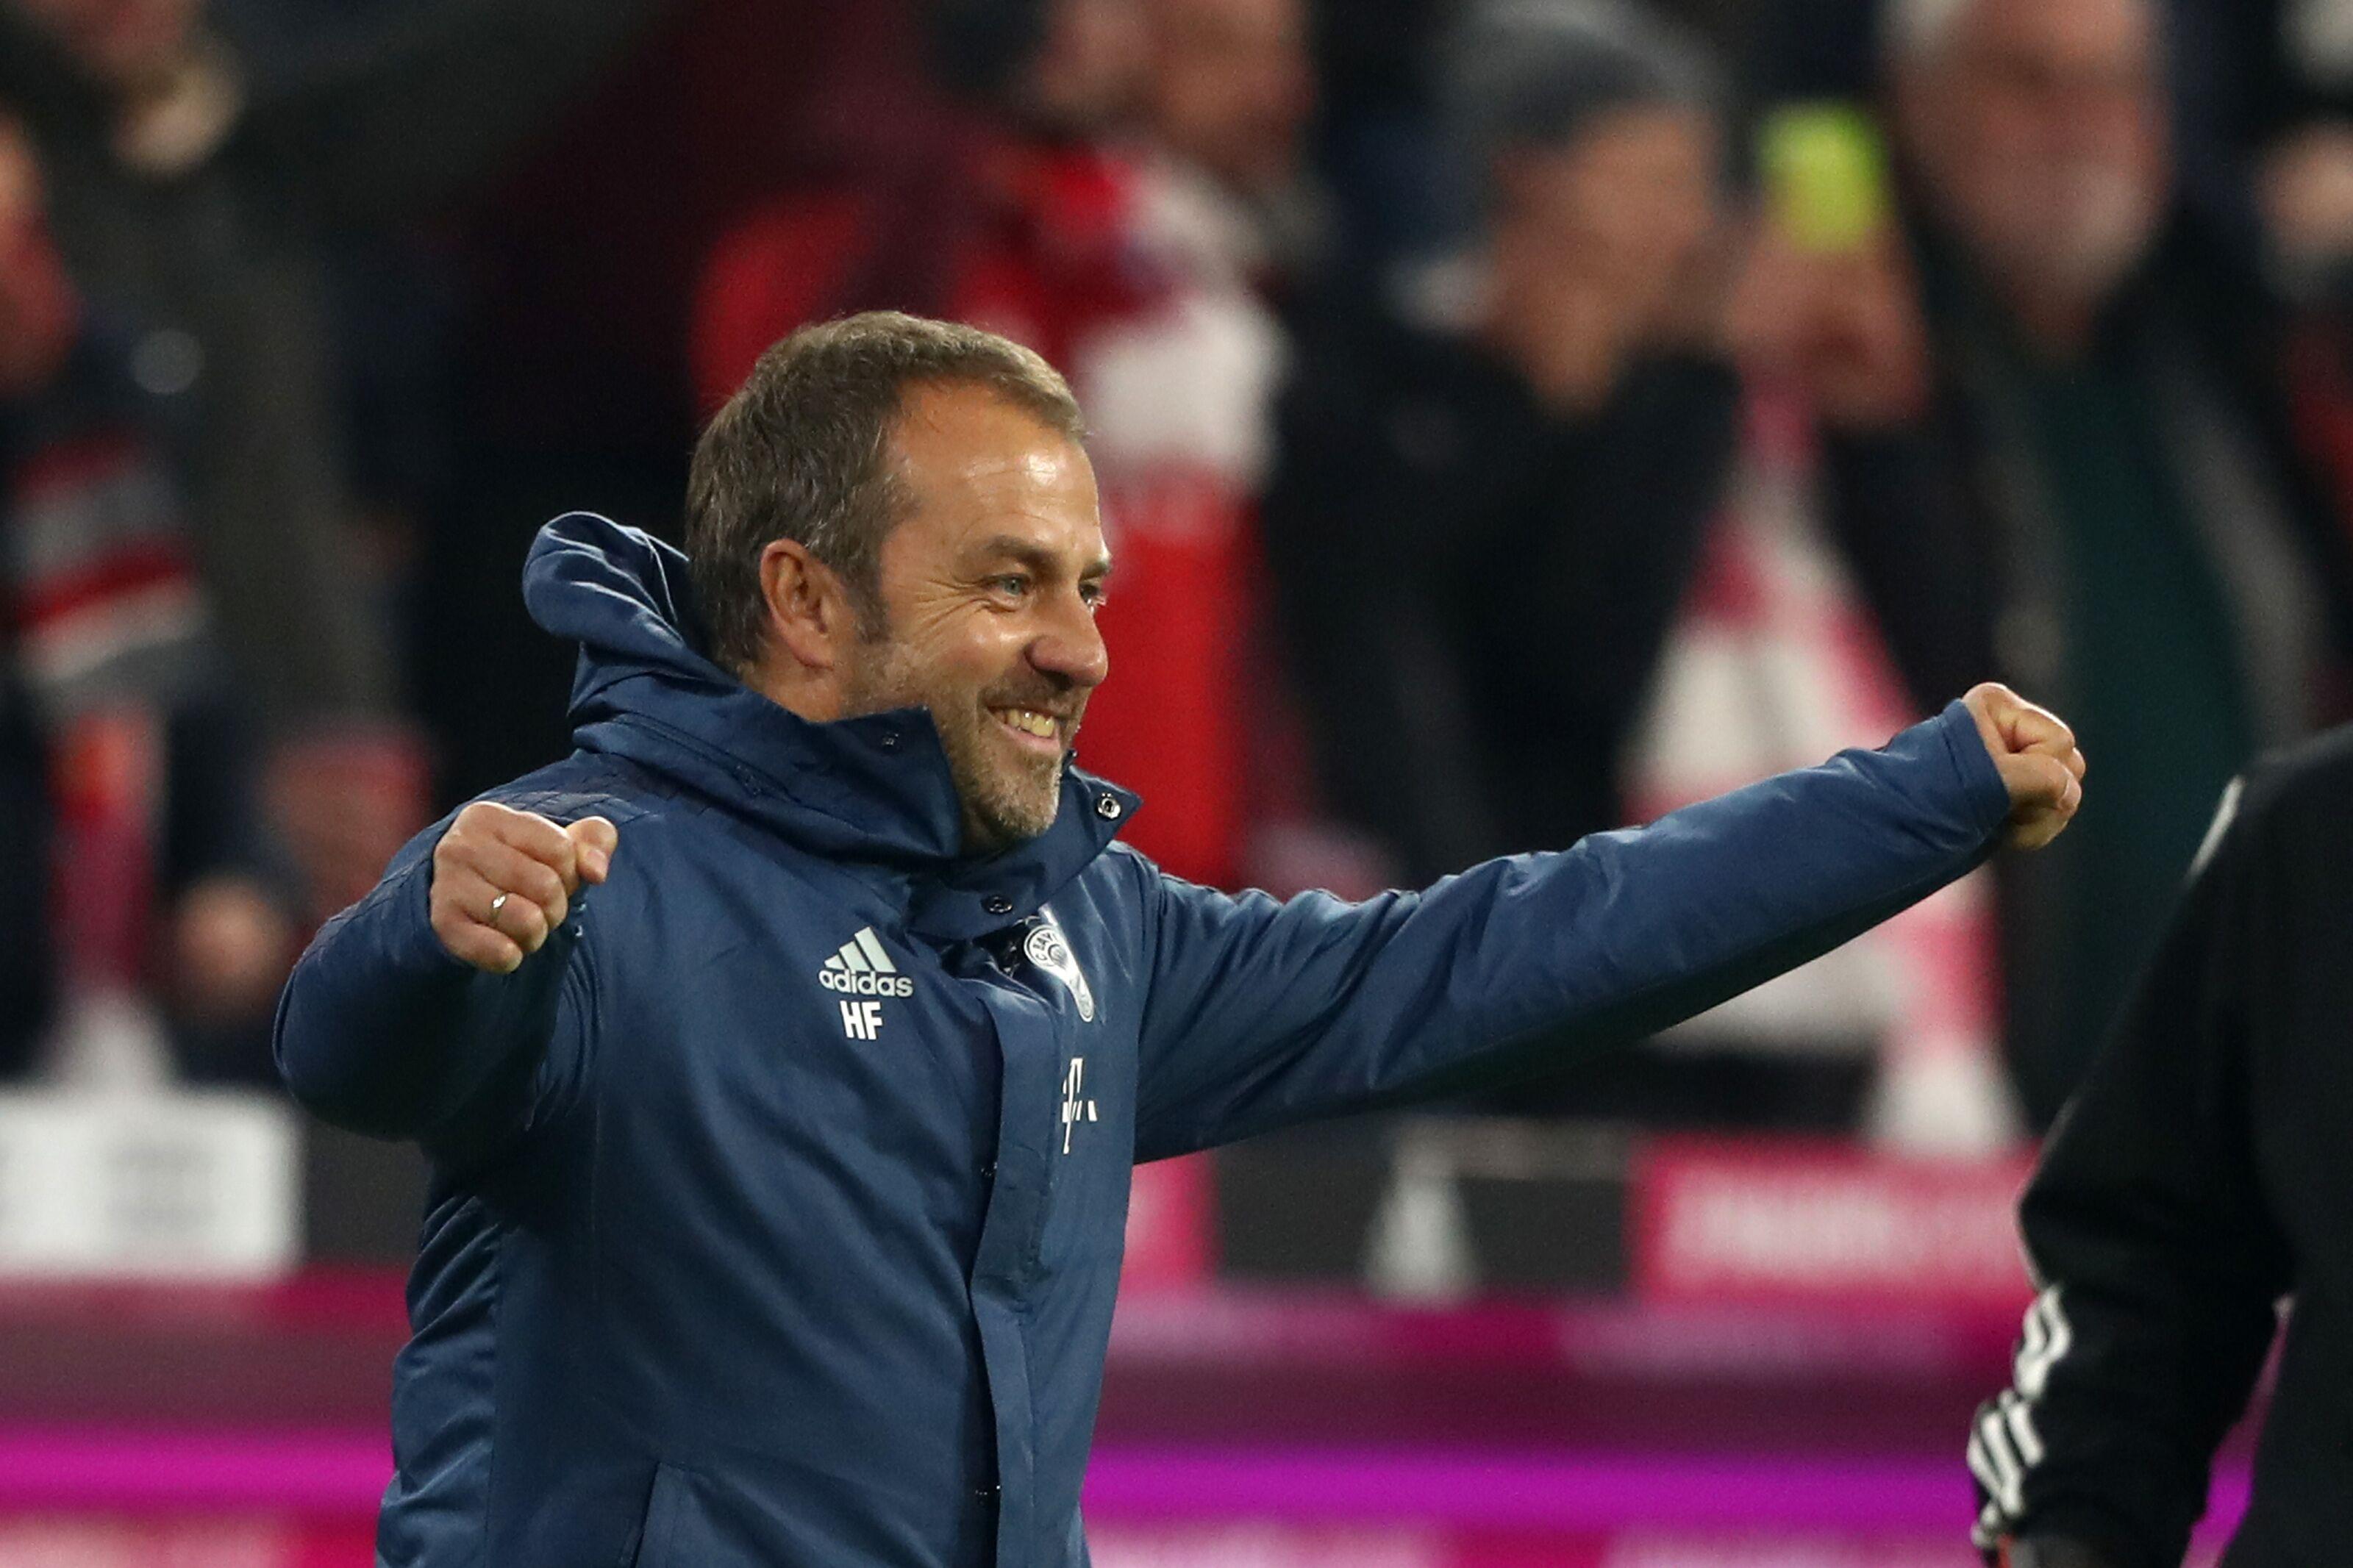 Bayern Munich set to hold talks with Hansi Flick this week